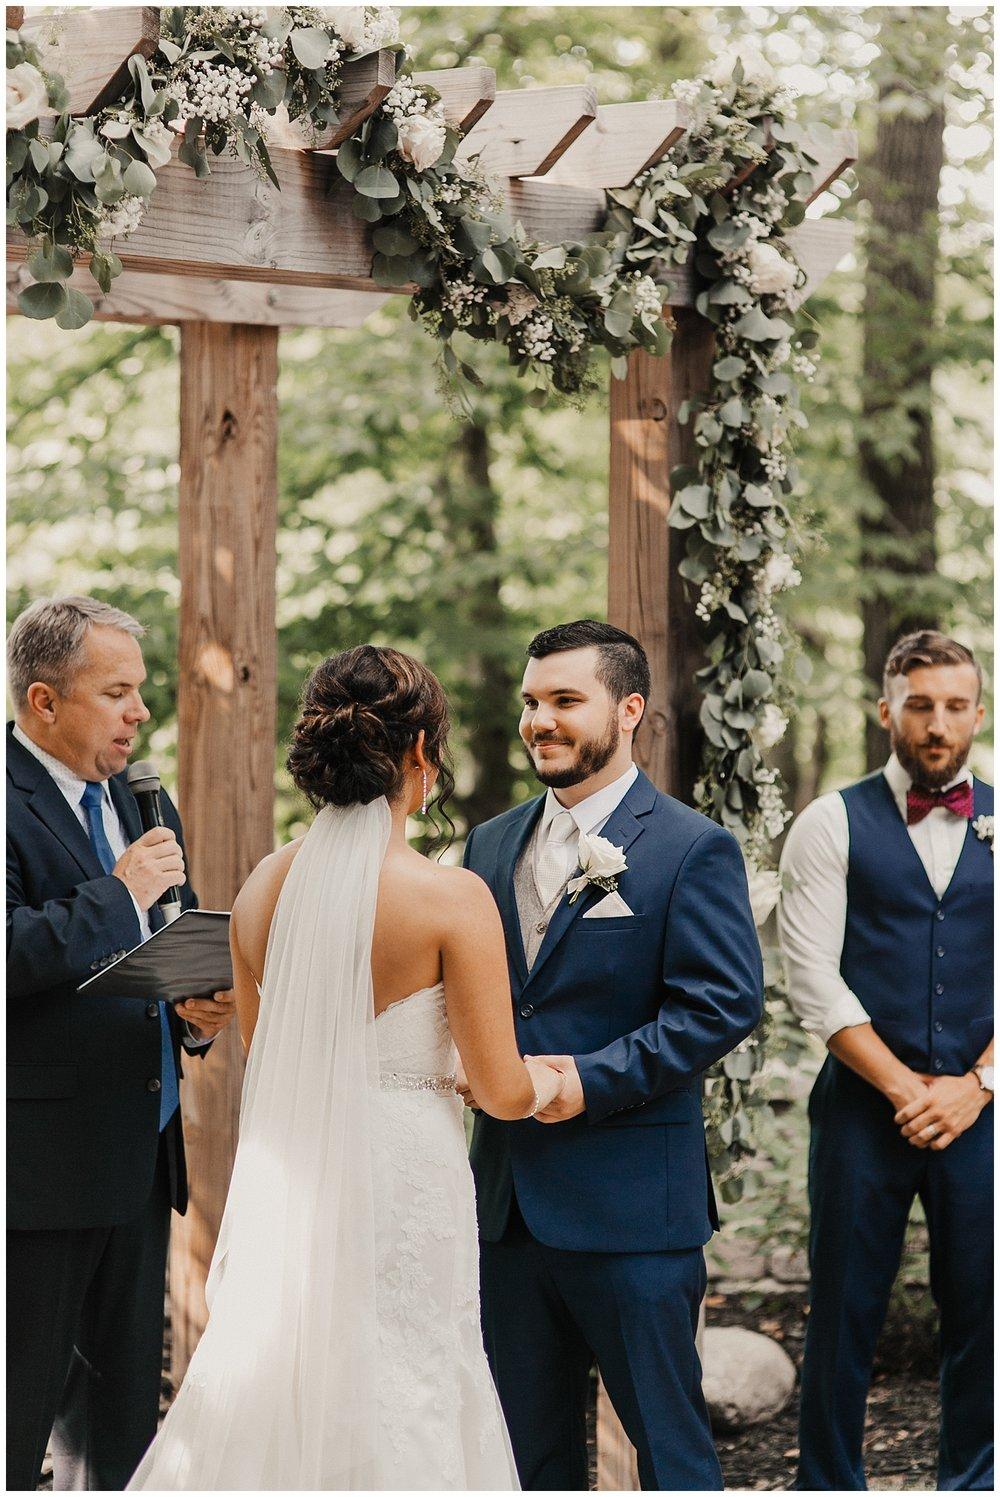 lindybeth photography - huisinga wedding - gable hill - blog-167.jpg